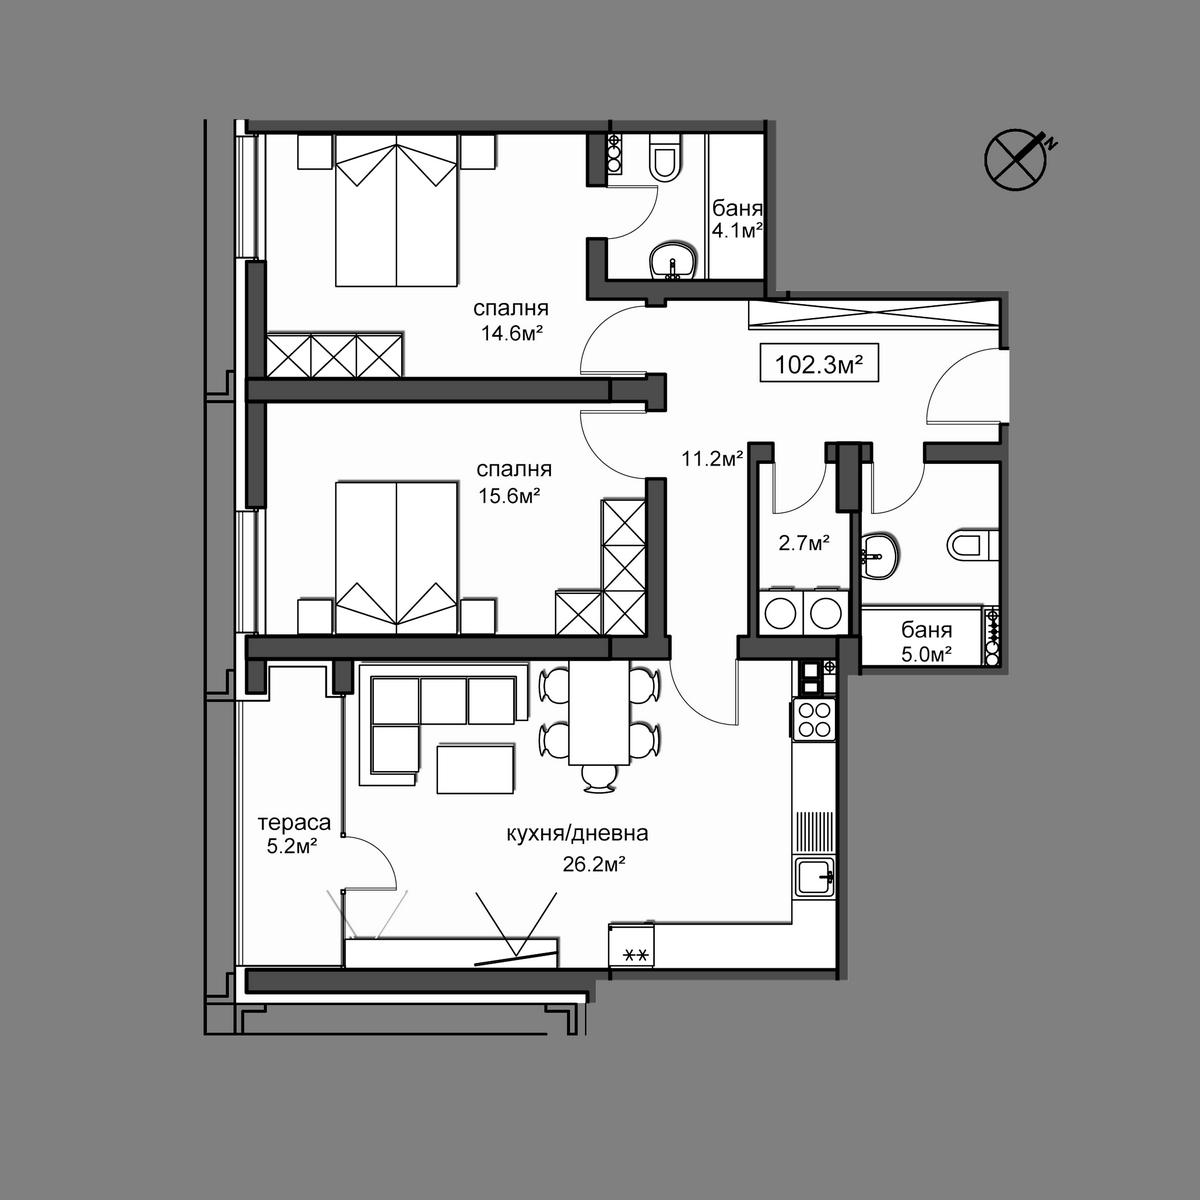 Продава апартамент ново строителство - Апартамент 9